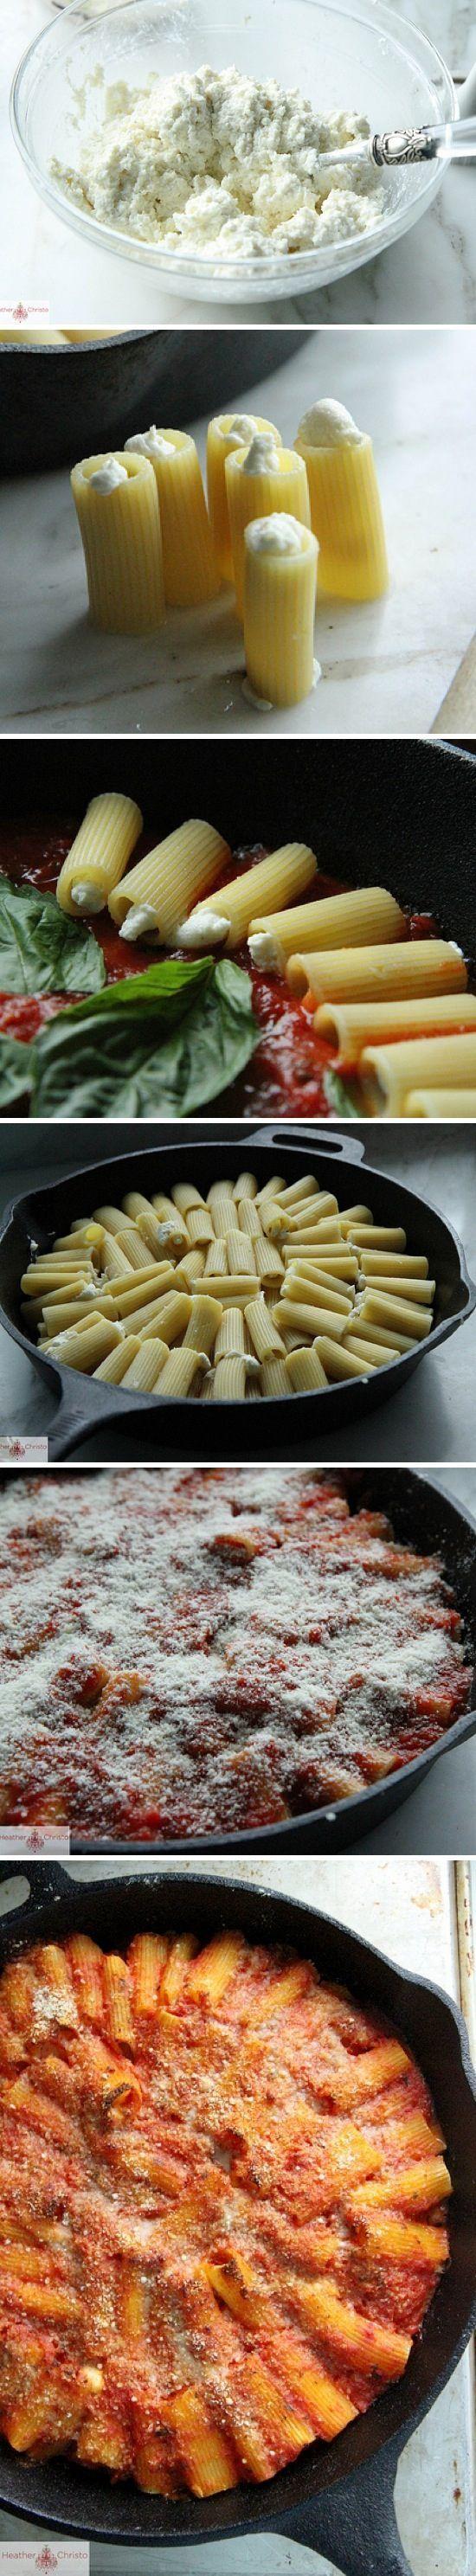 Skillet Baked Stuffed Rigatoni | Recipe By Photo